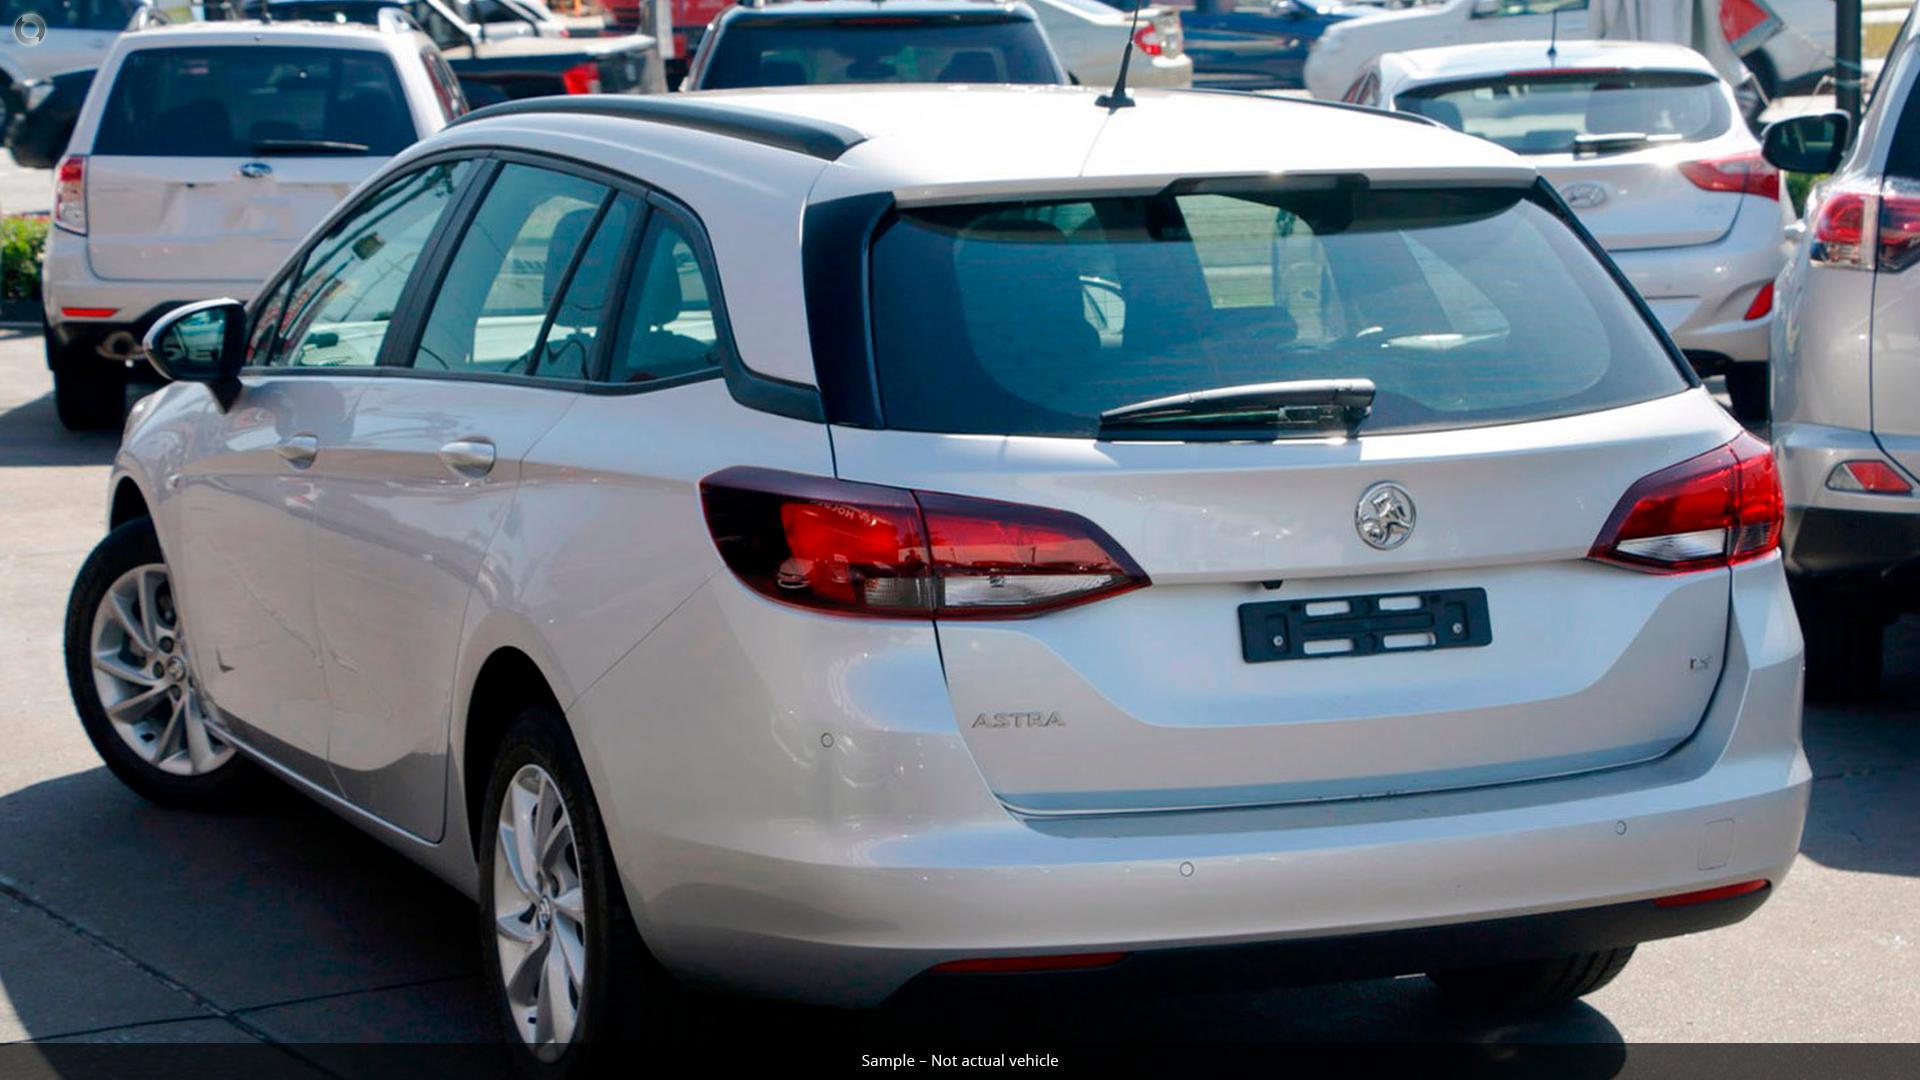 2018 Holden Astra LS+ BK